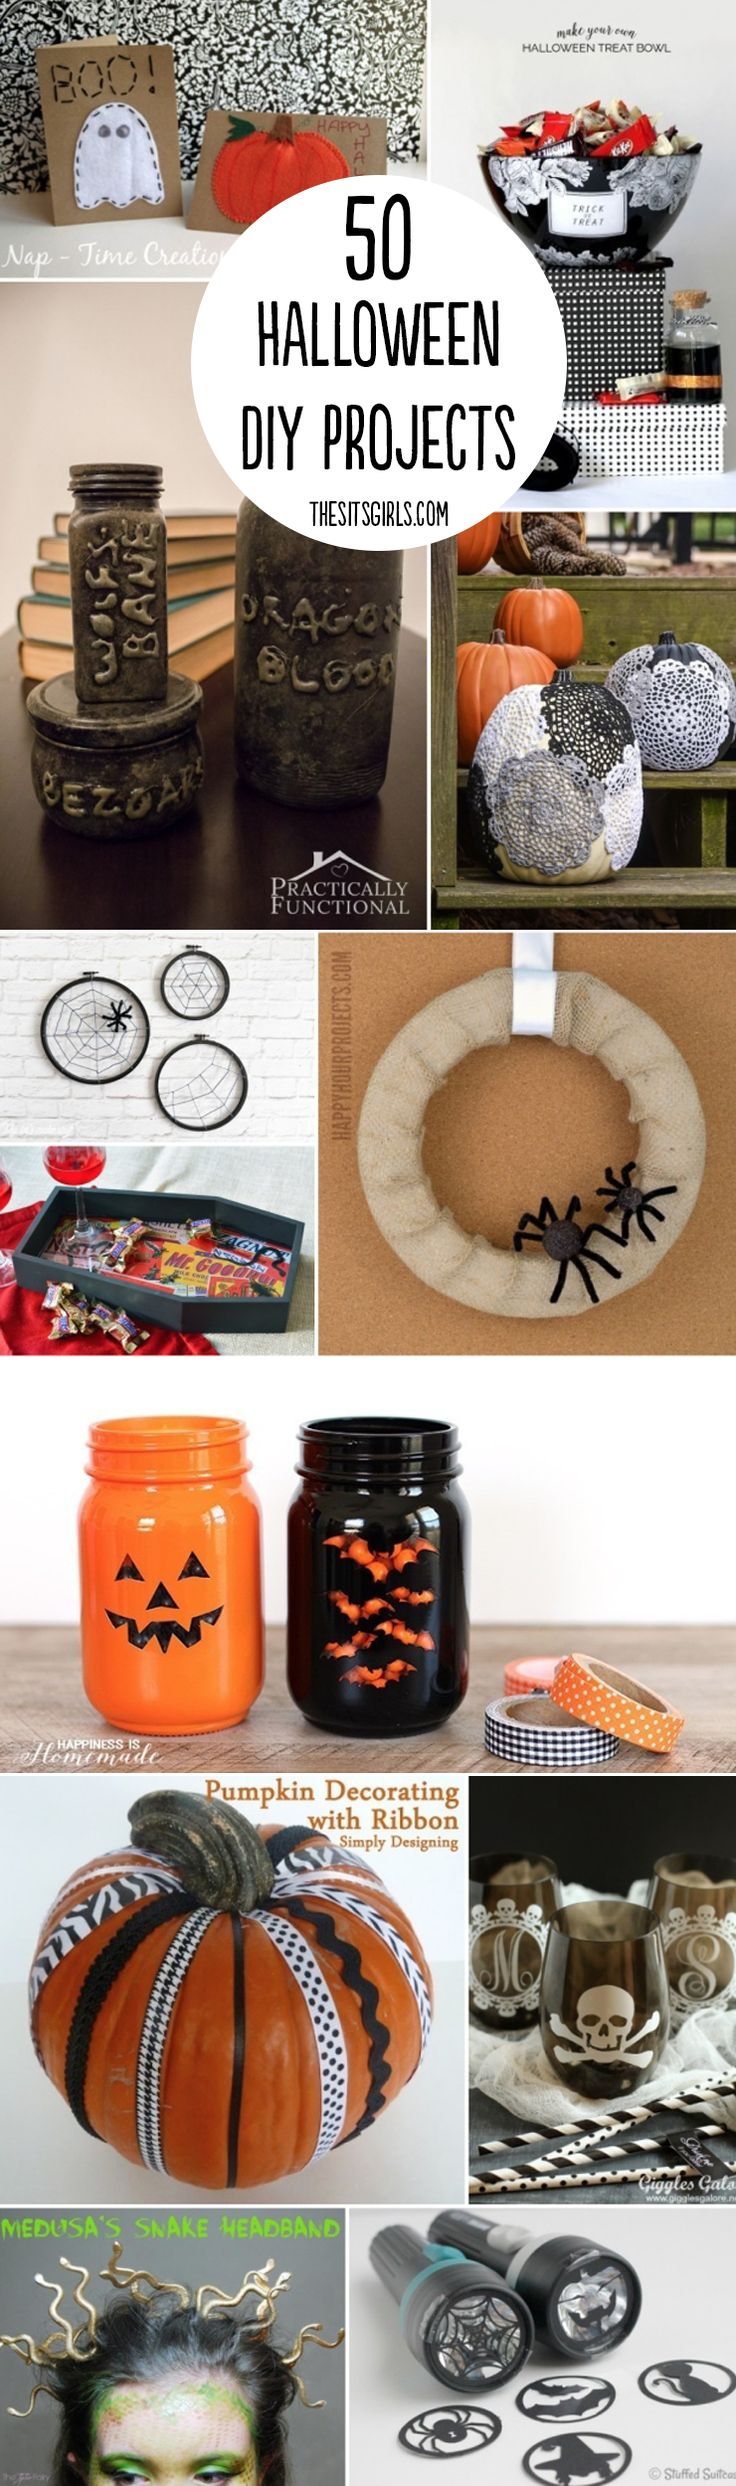 50 halloween diy projects - Halloween Diy Projects